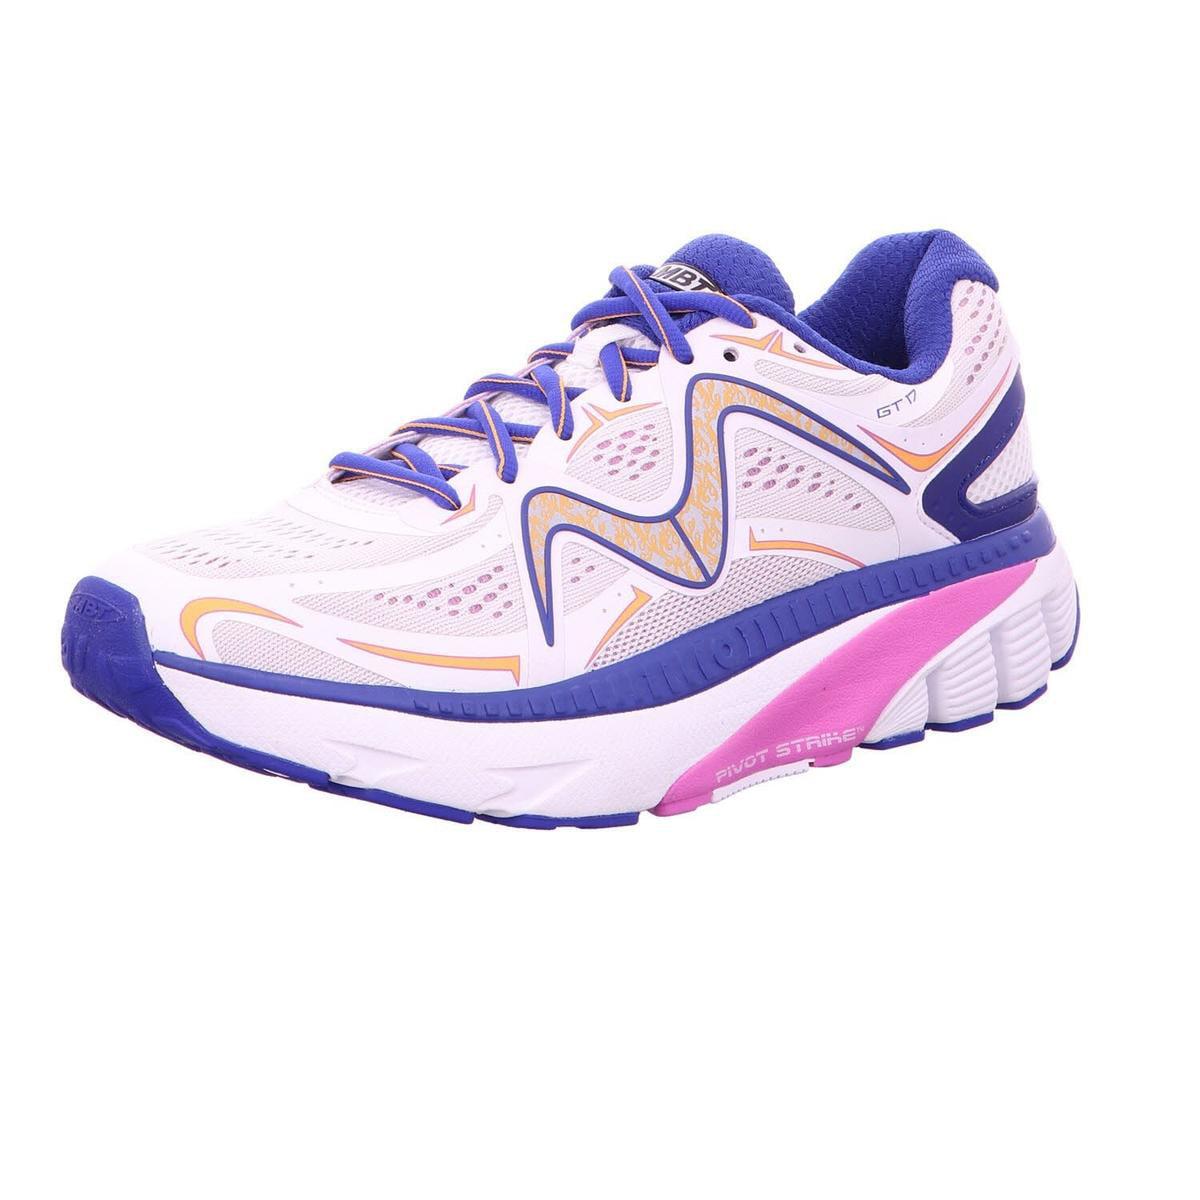 MBT Run Matrix GT 17 Womens White/Purple/Na Sneakers